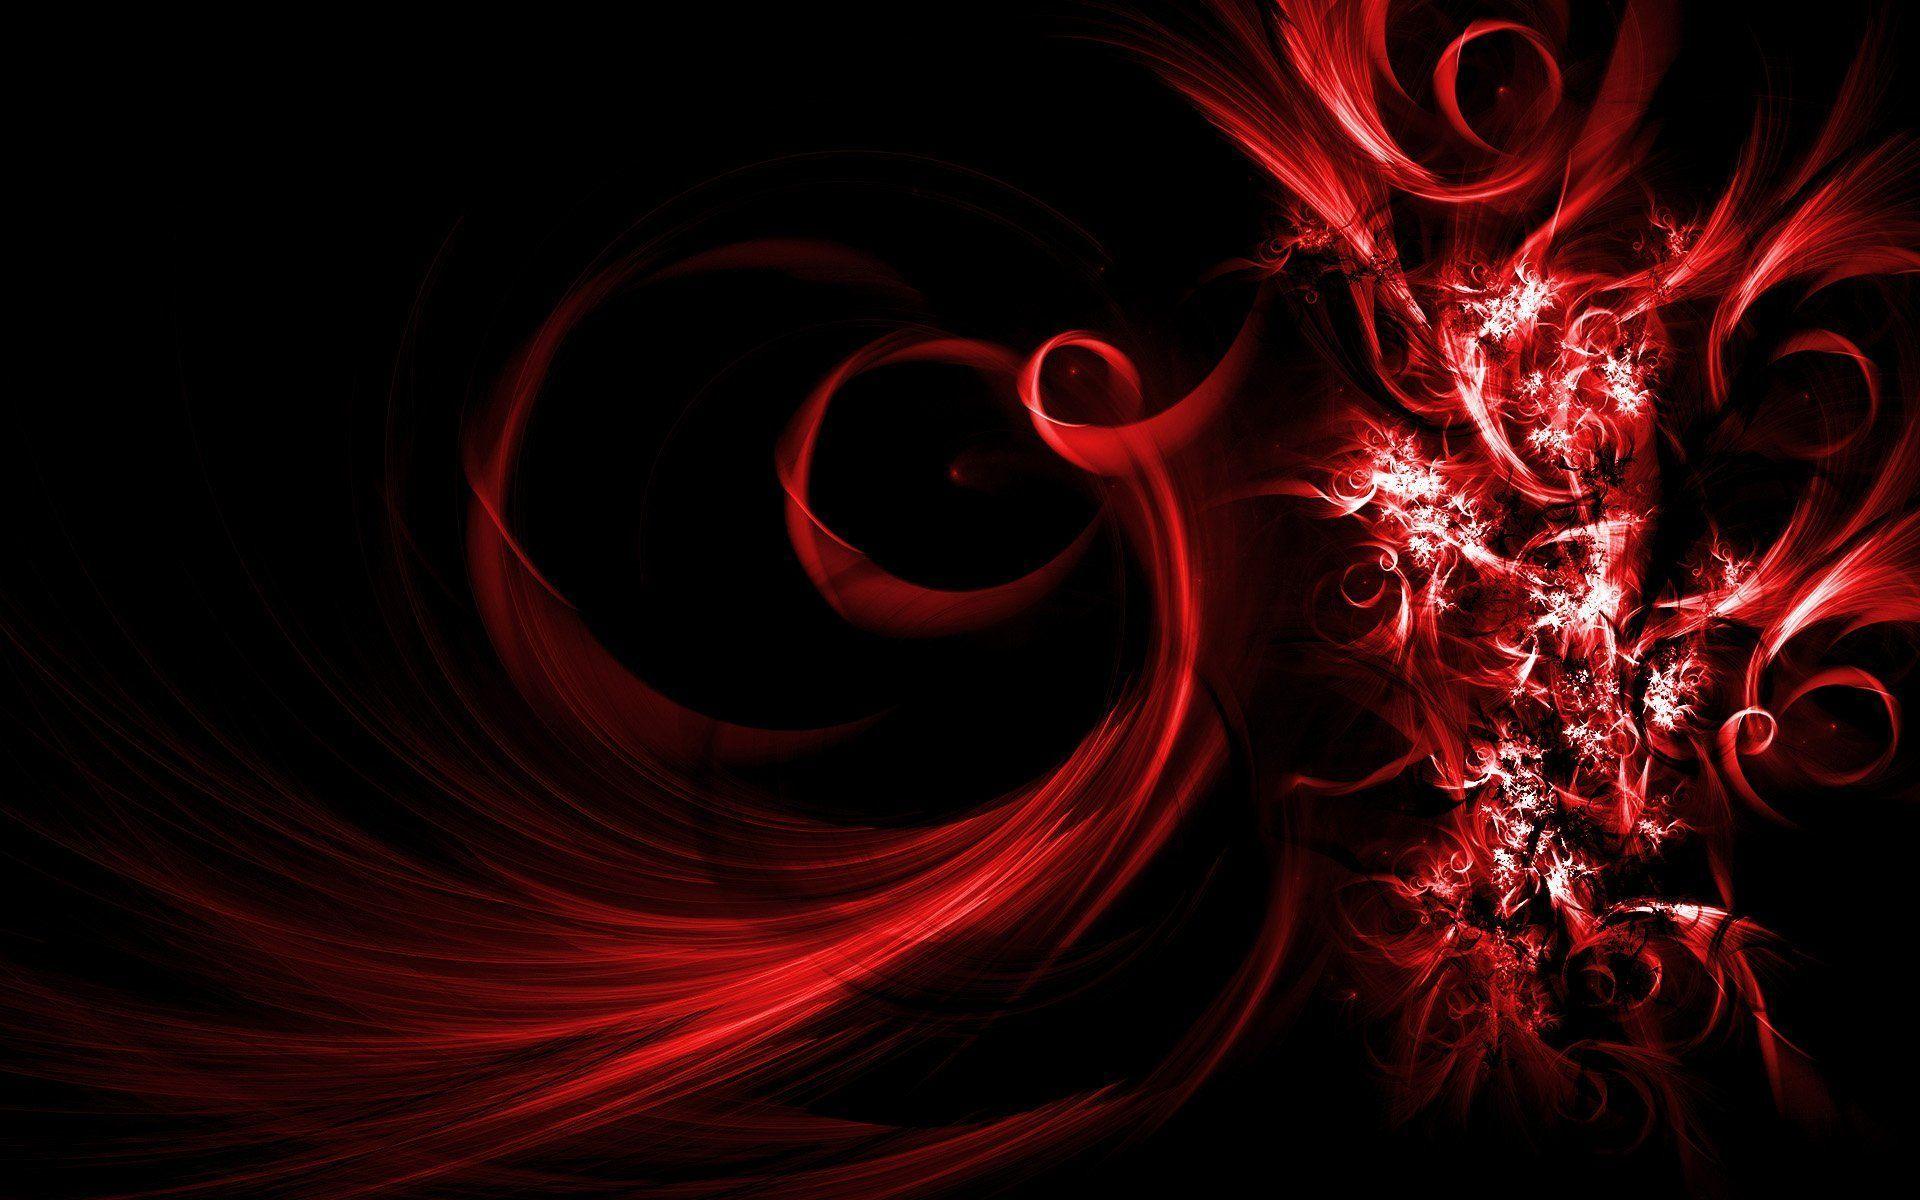 Full Hd P Abstract Wallpapers Desktop Backgrounds Hd 1920 1200 Black And Red Abstract Red And Black Wallpaper Black Abstract Background Abstract Art Wallpaper